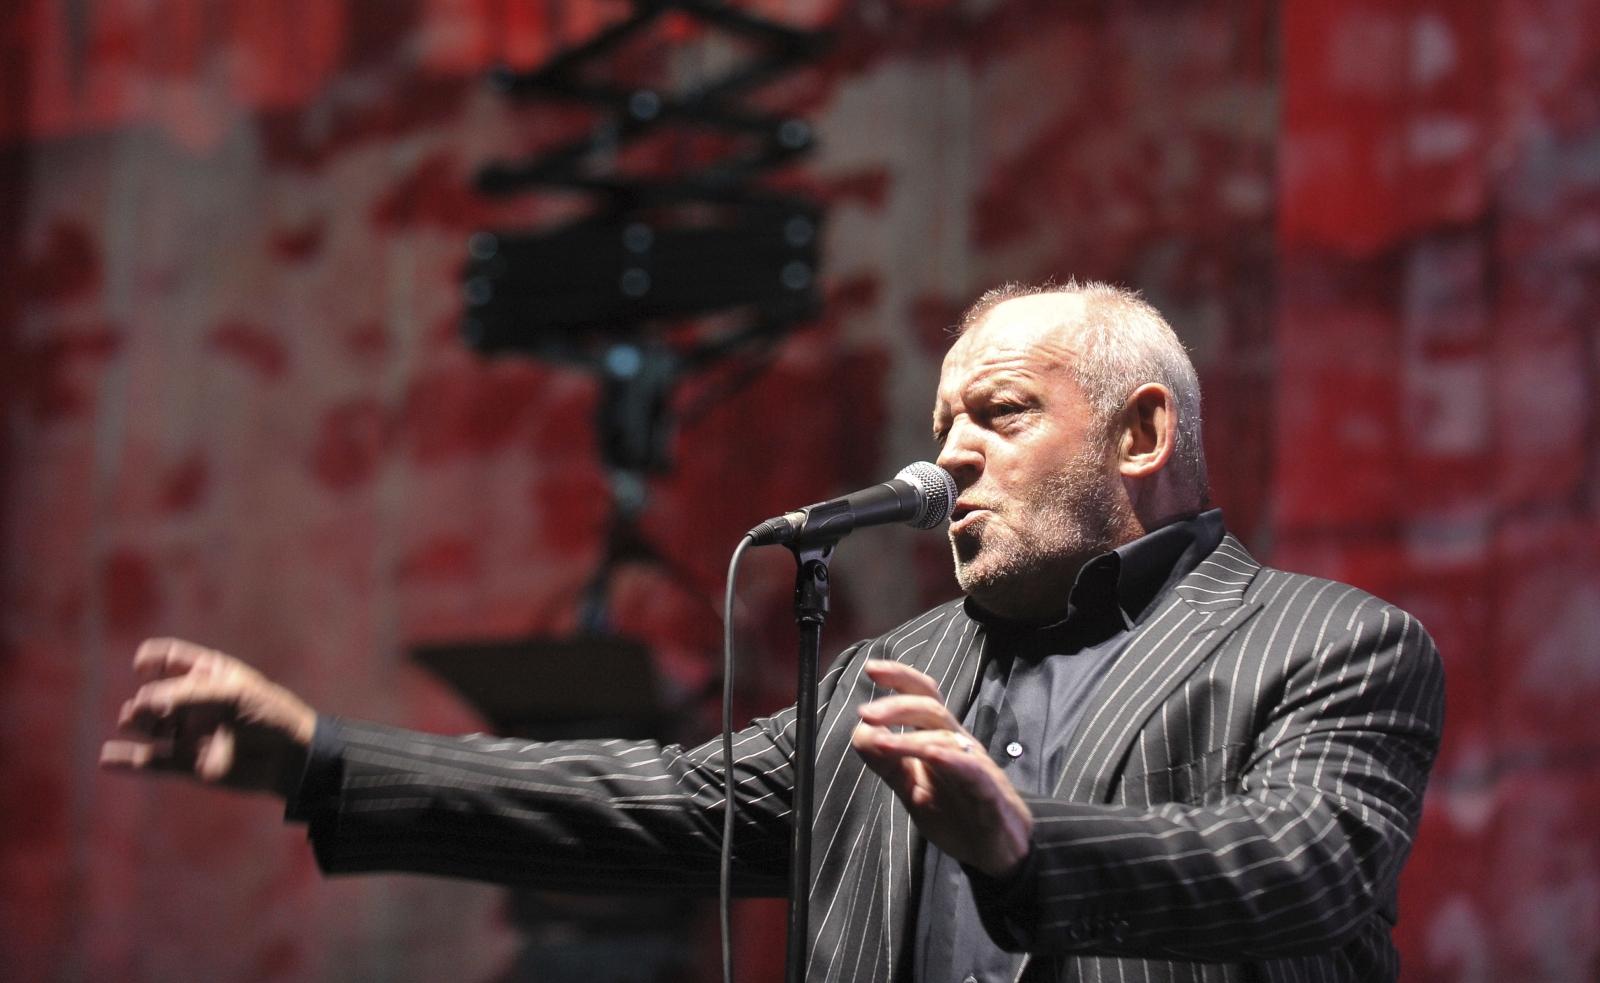 Singer Joe Cocker has died, his management team have confirmed